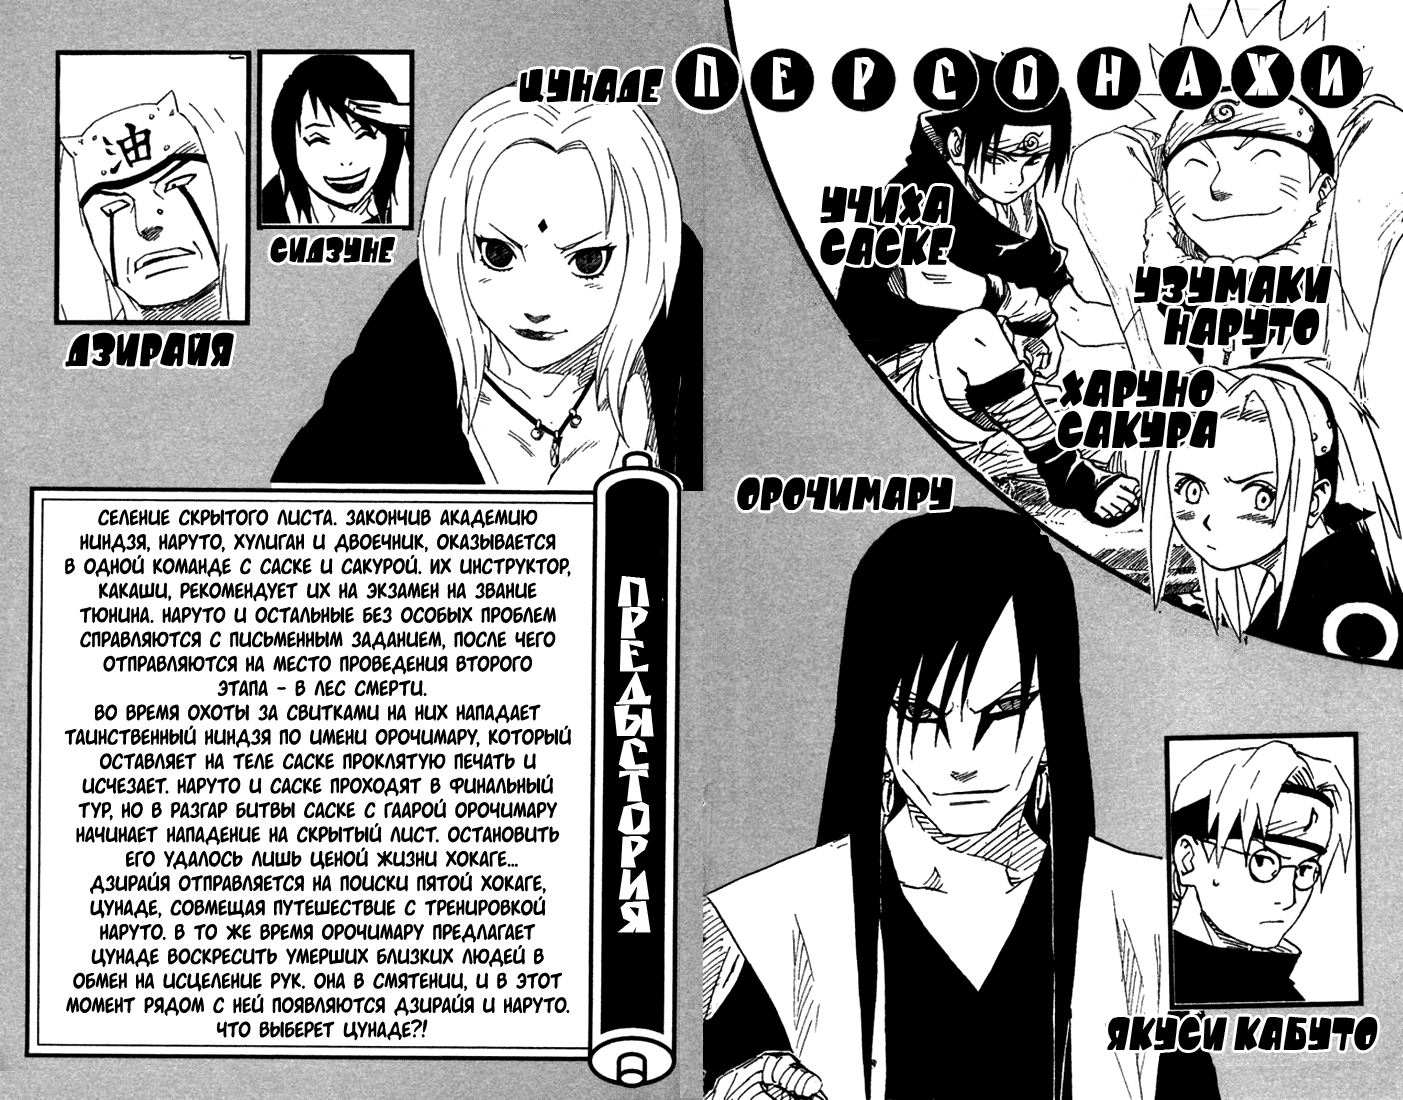 Манга Naruto / Наруто Манга Naruto Глава # 163 - Неугасимое ..., страница 2